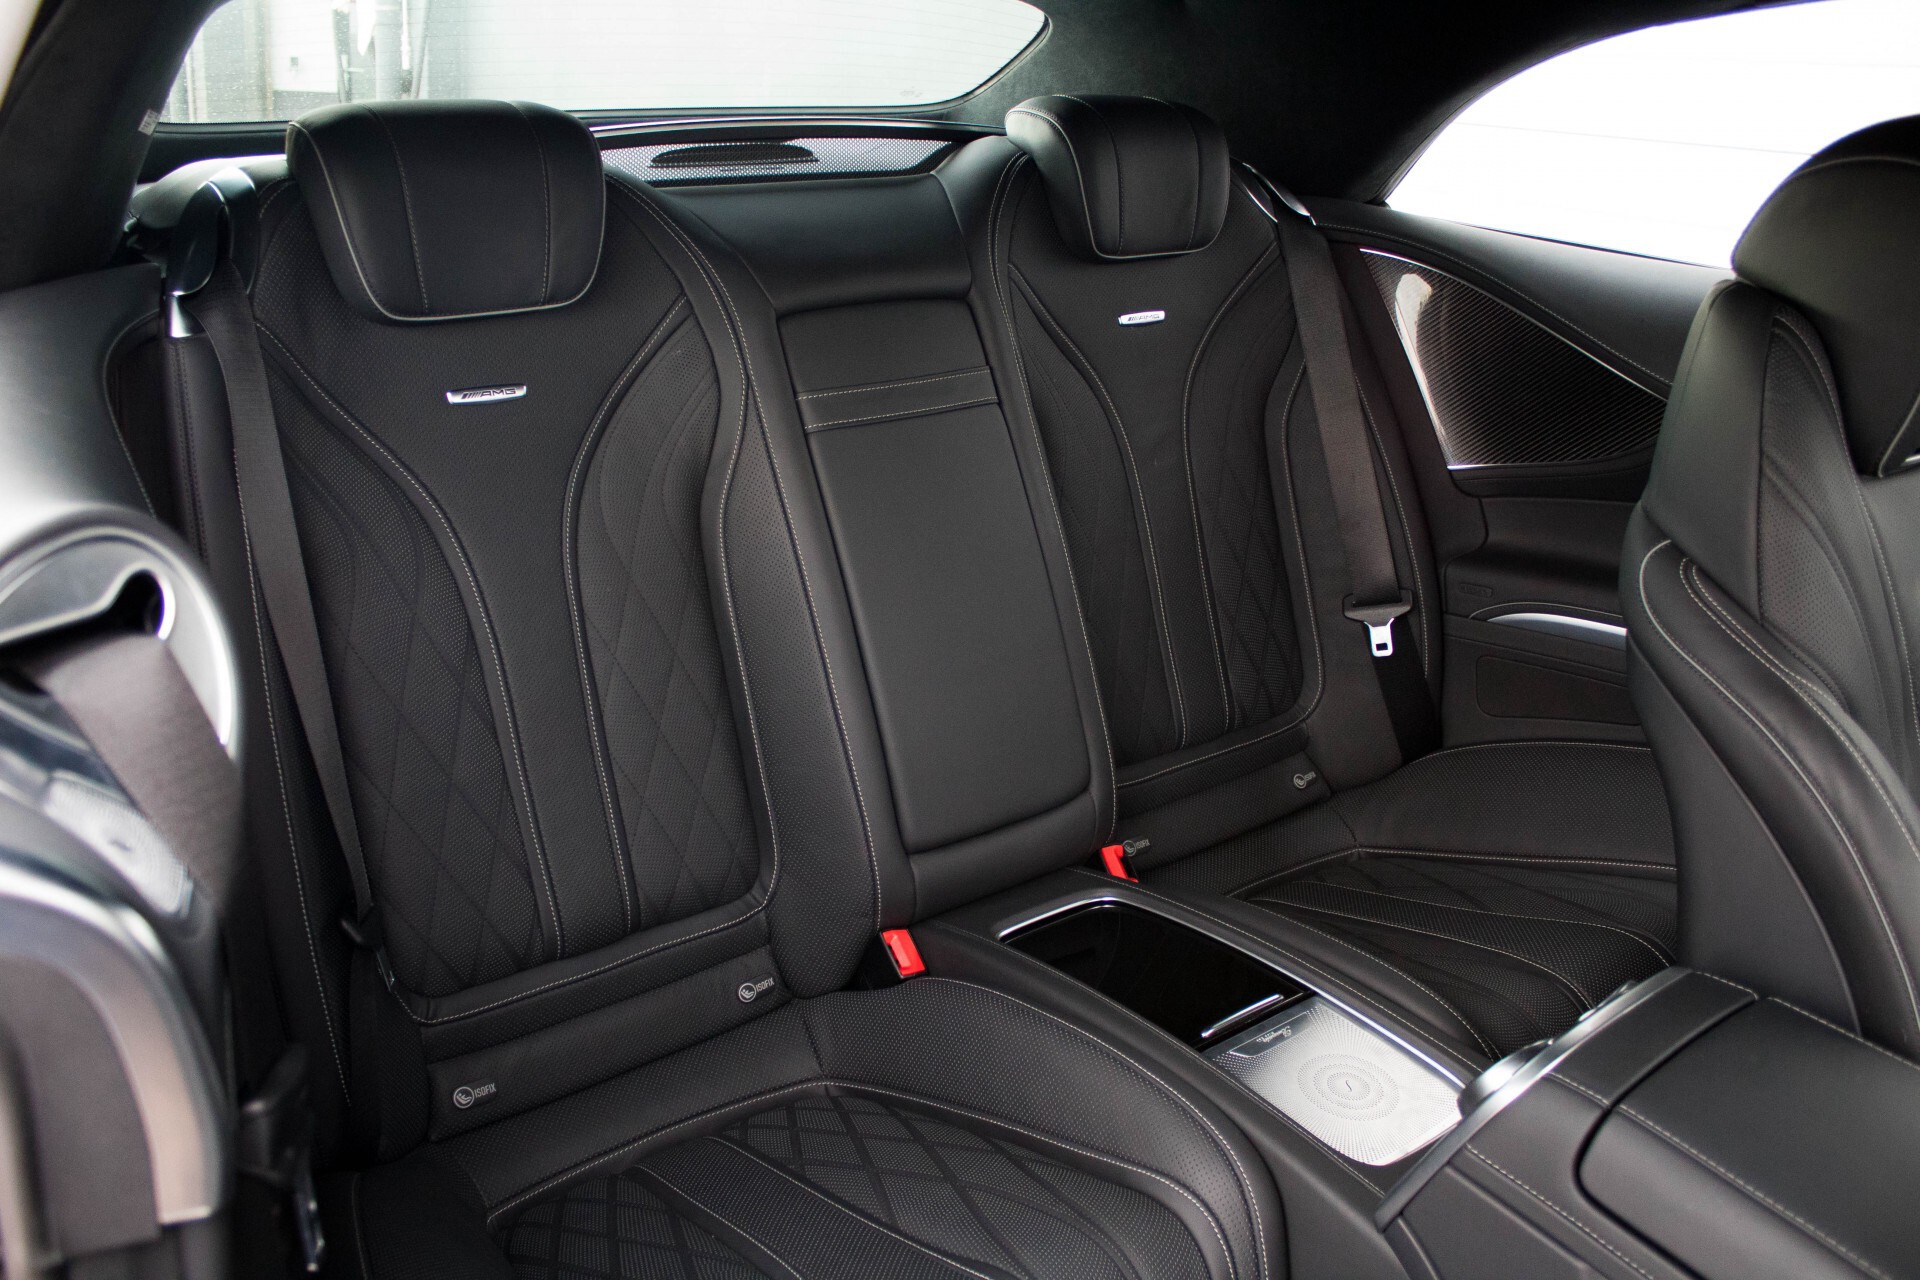 Mercedes-Benz S-Klasse Cabrio 63 AMG 4-M Ceramic/Designo/Carbon/Burmester High End Aut Foto 6